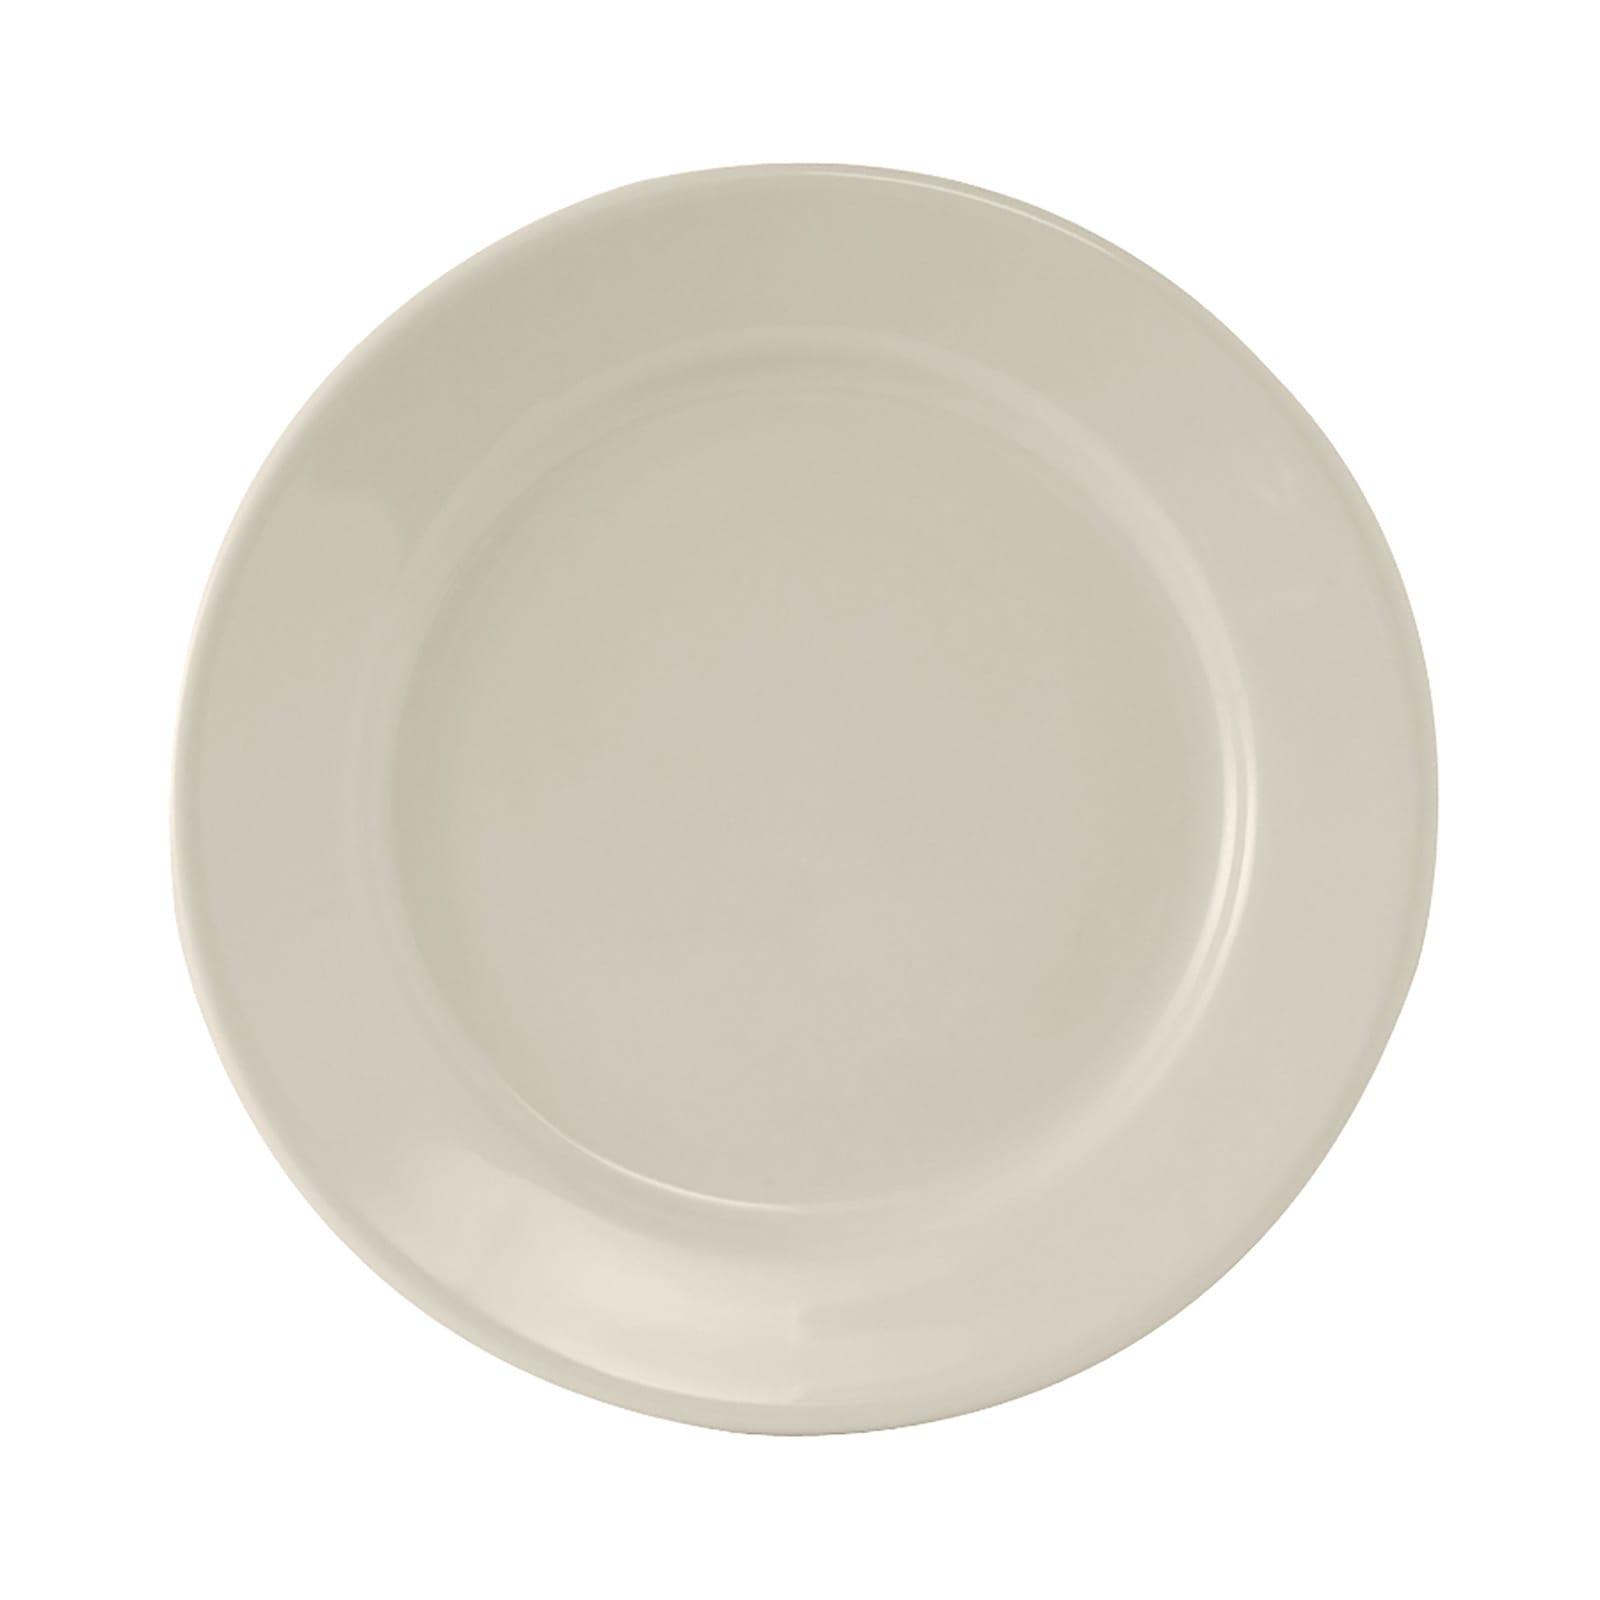 "Tuxton TRE-022 8.38"" Round Reno Plate - Ceramic, American White"